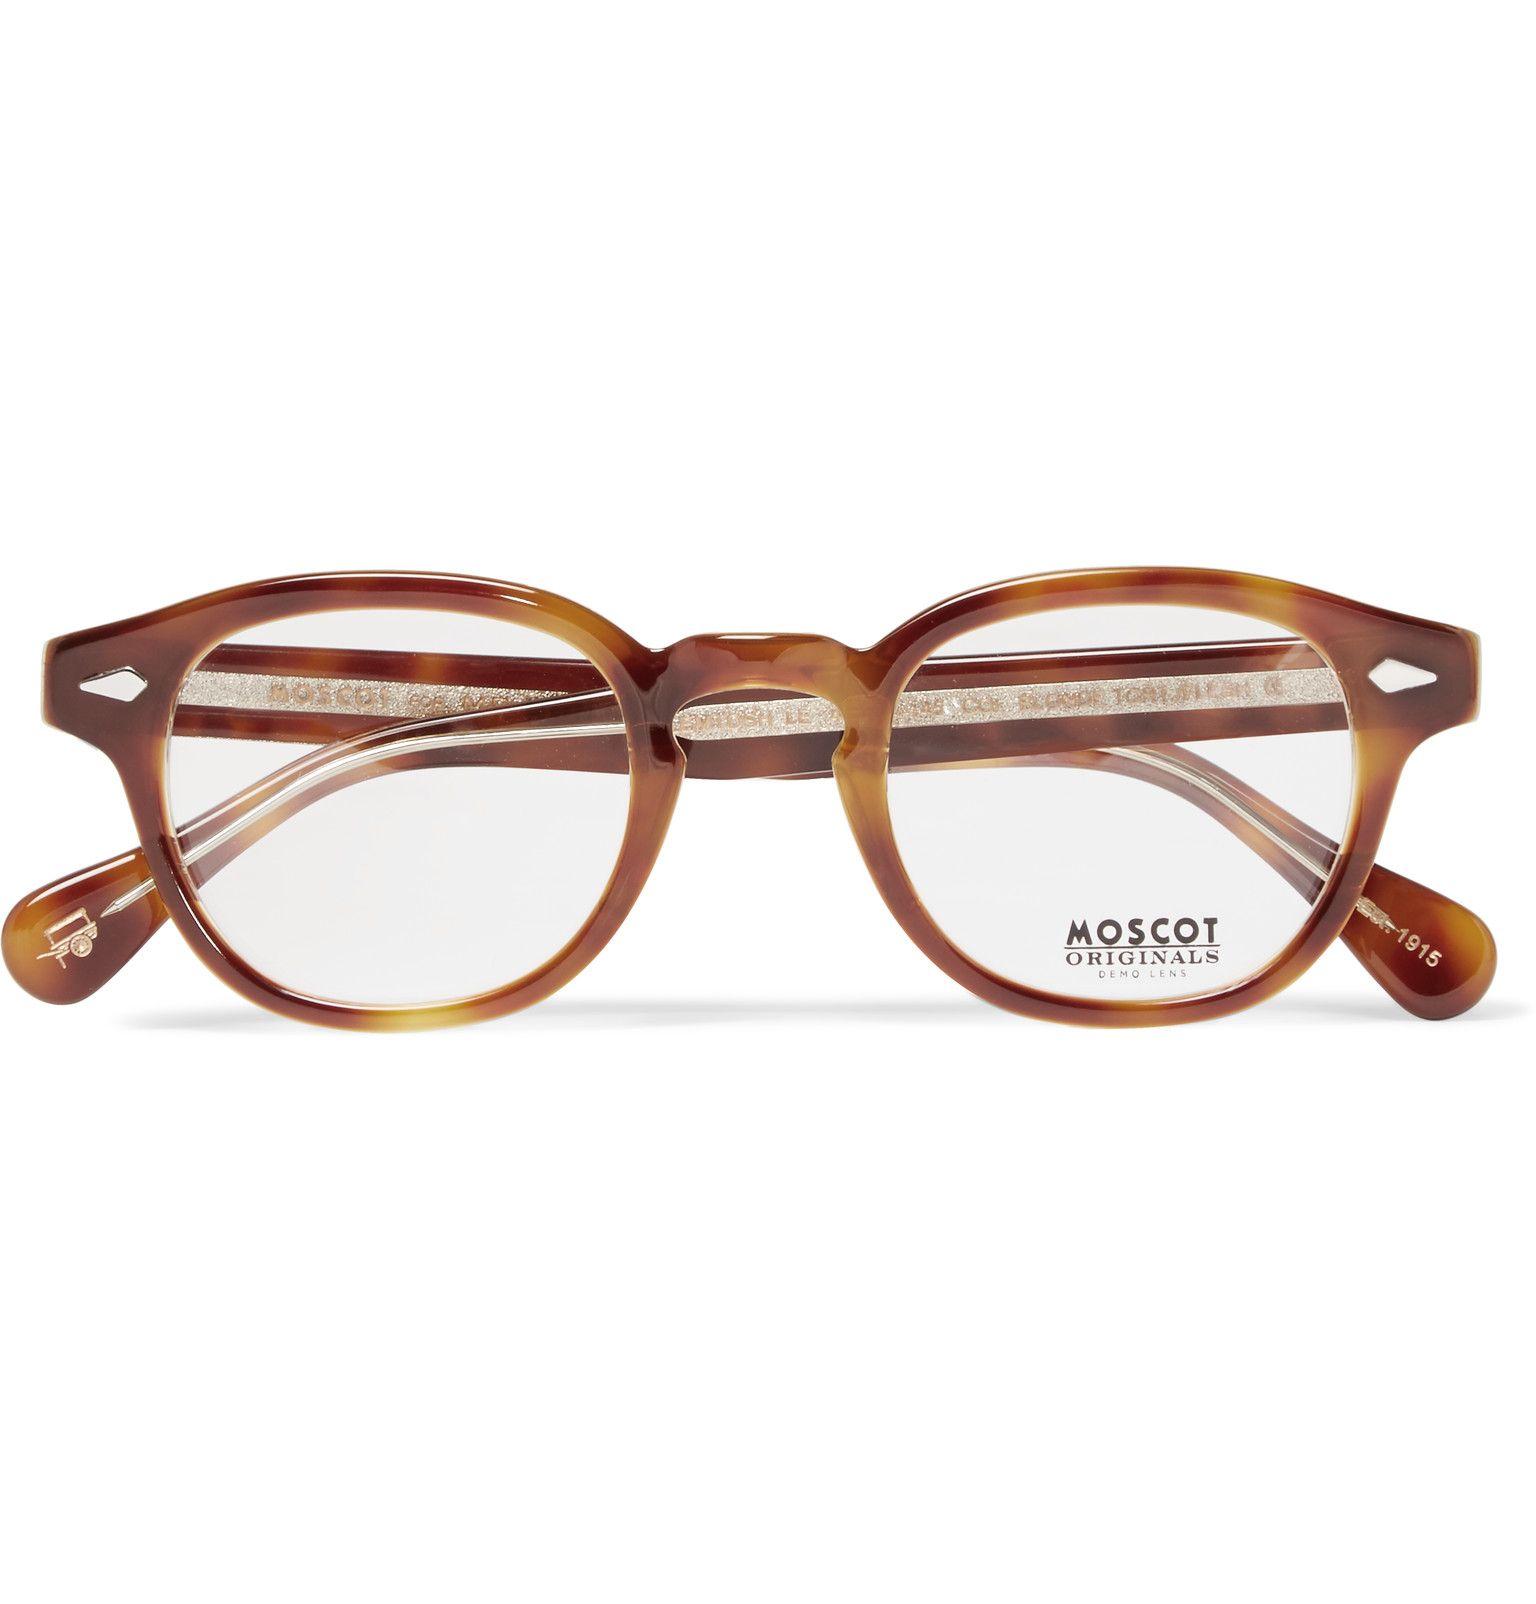 3922232c1a3f Shop men s glasses at MR PORTER